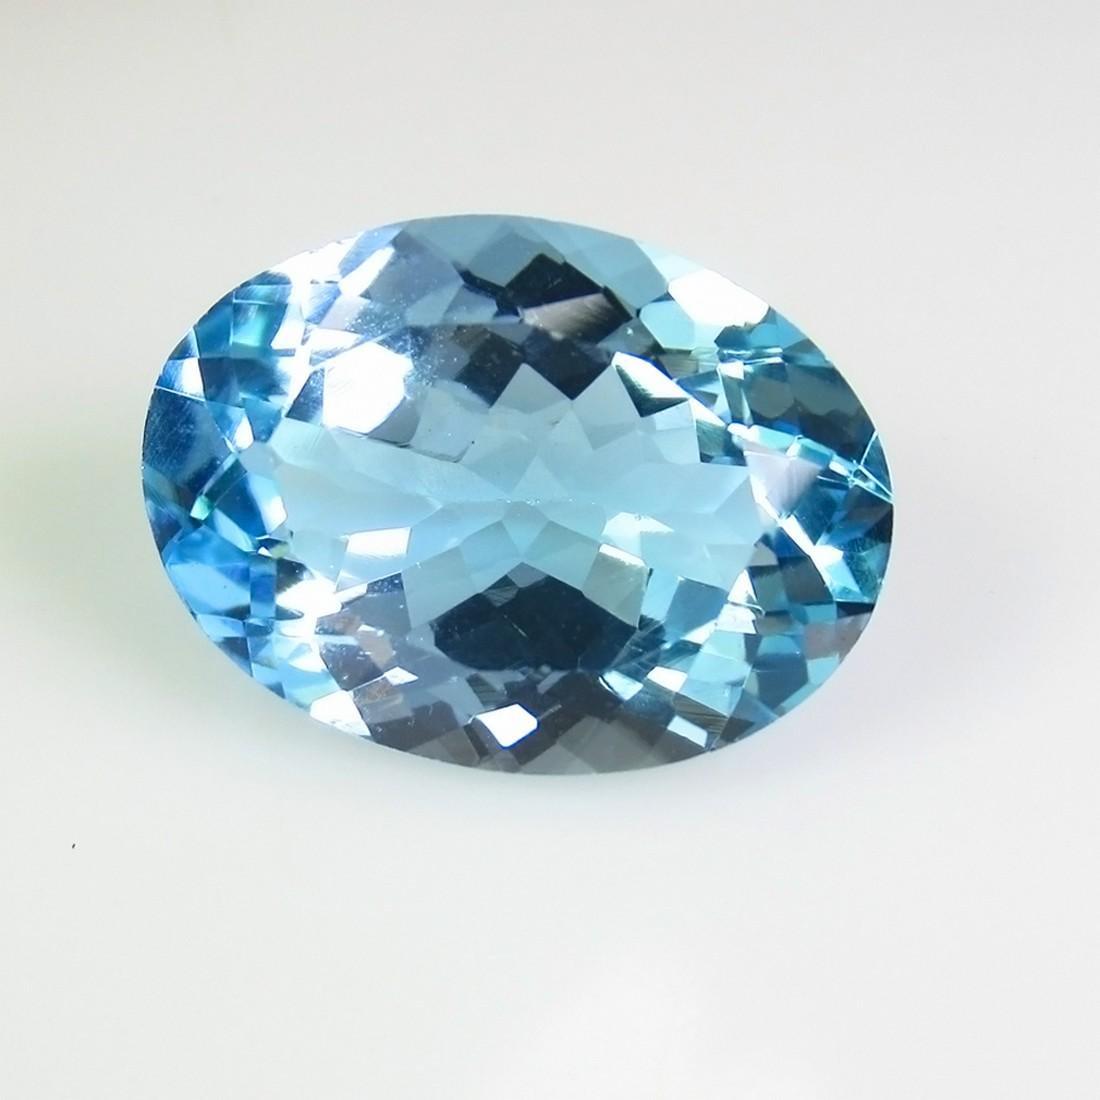 13.77 Ct Genuine Brazil Blue Topaz 18X13 mm Oval Cut